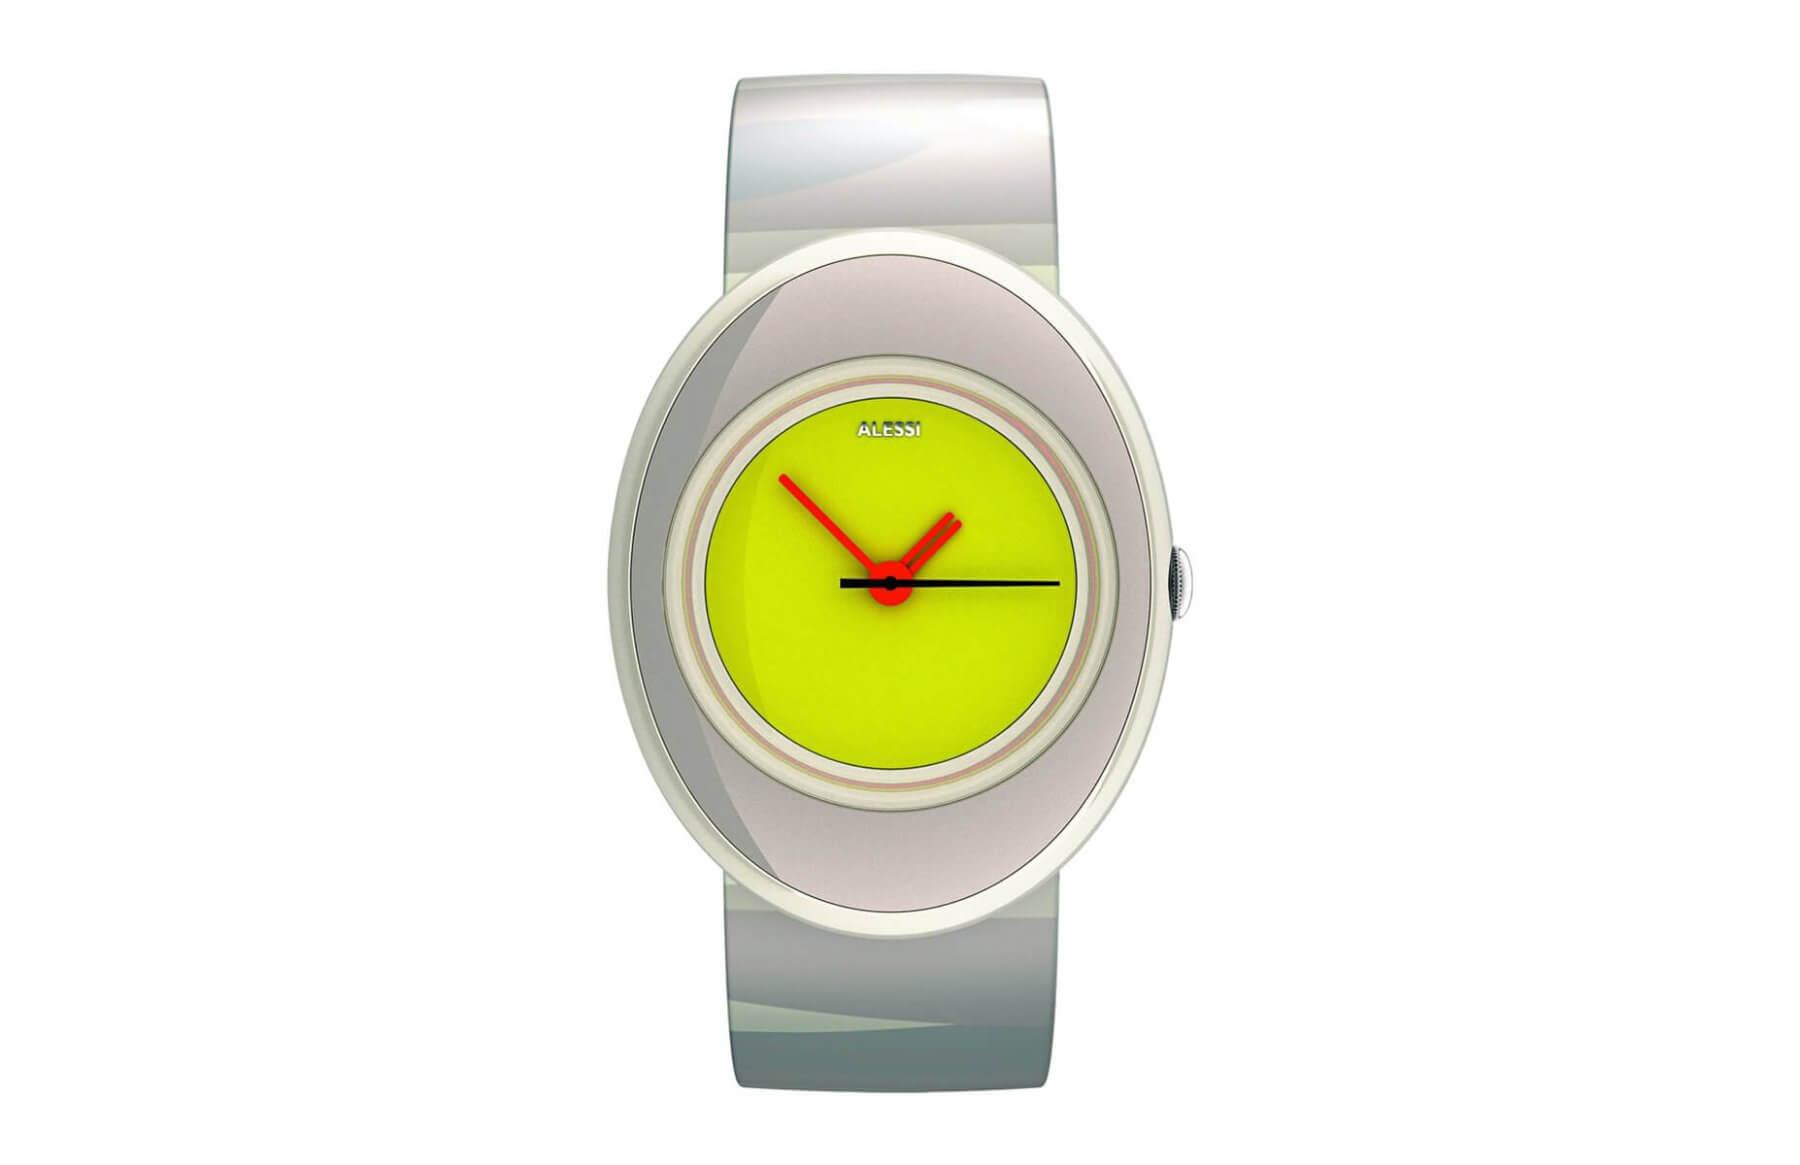 Zegarek Millenium Jr. Alessi